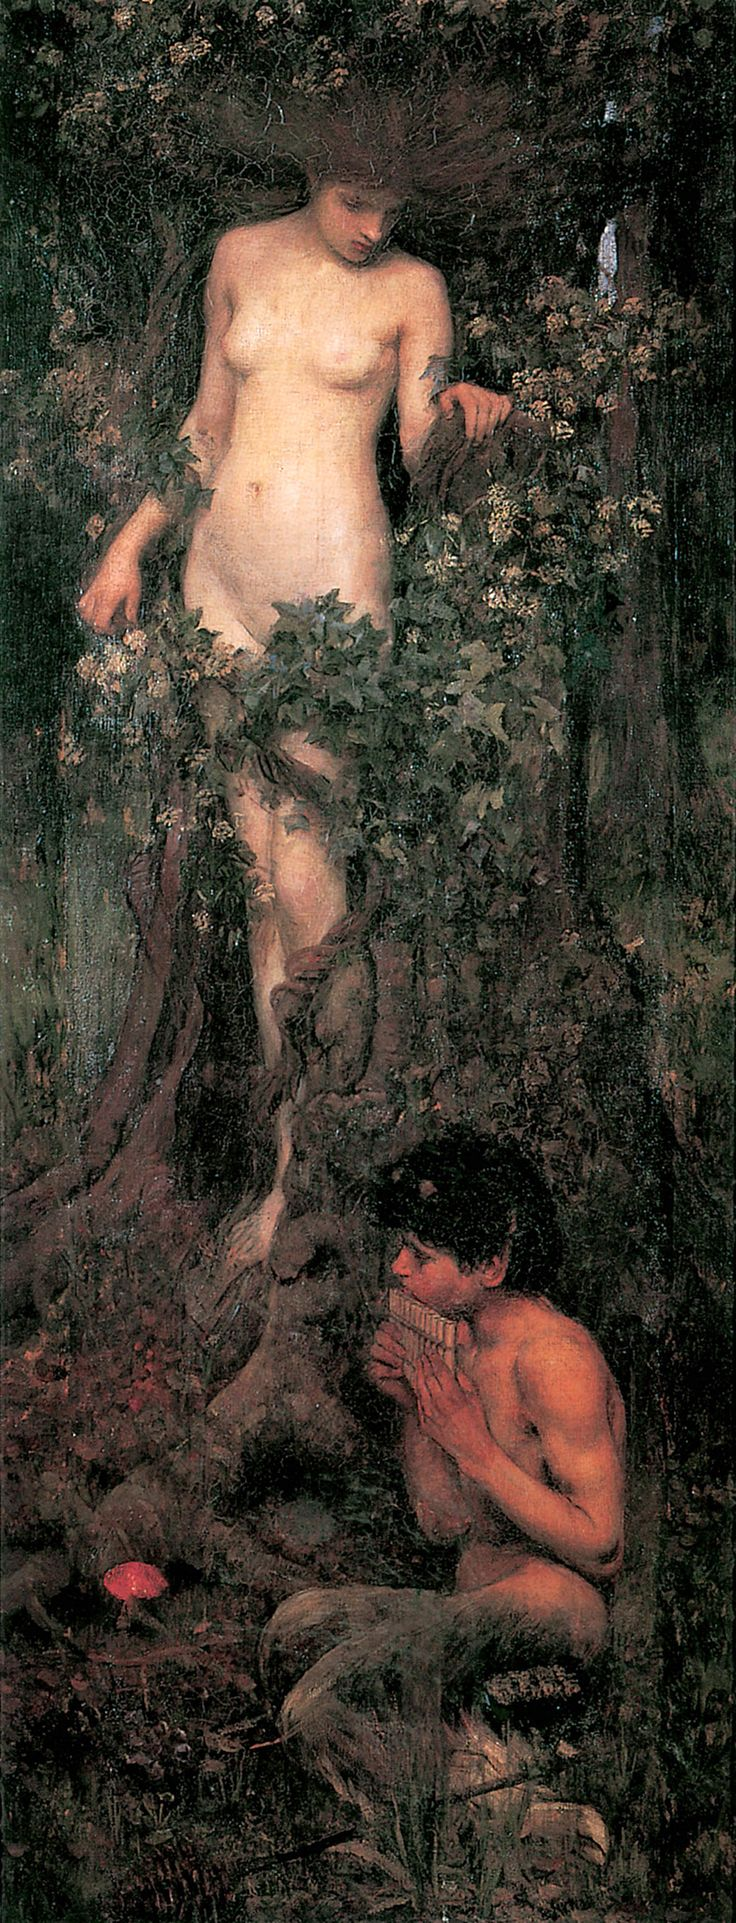 John William Waterhouse (English, 1849-1917). A Hamadryad, 1893